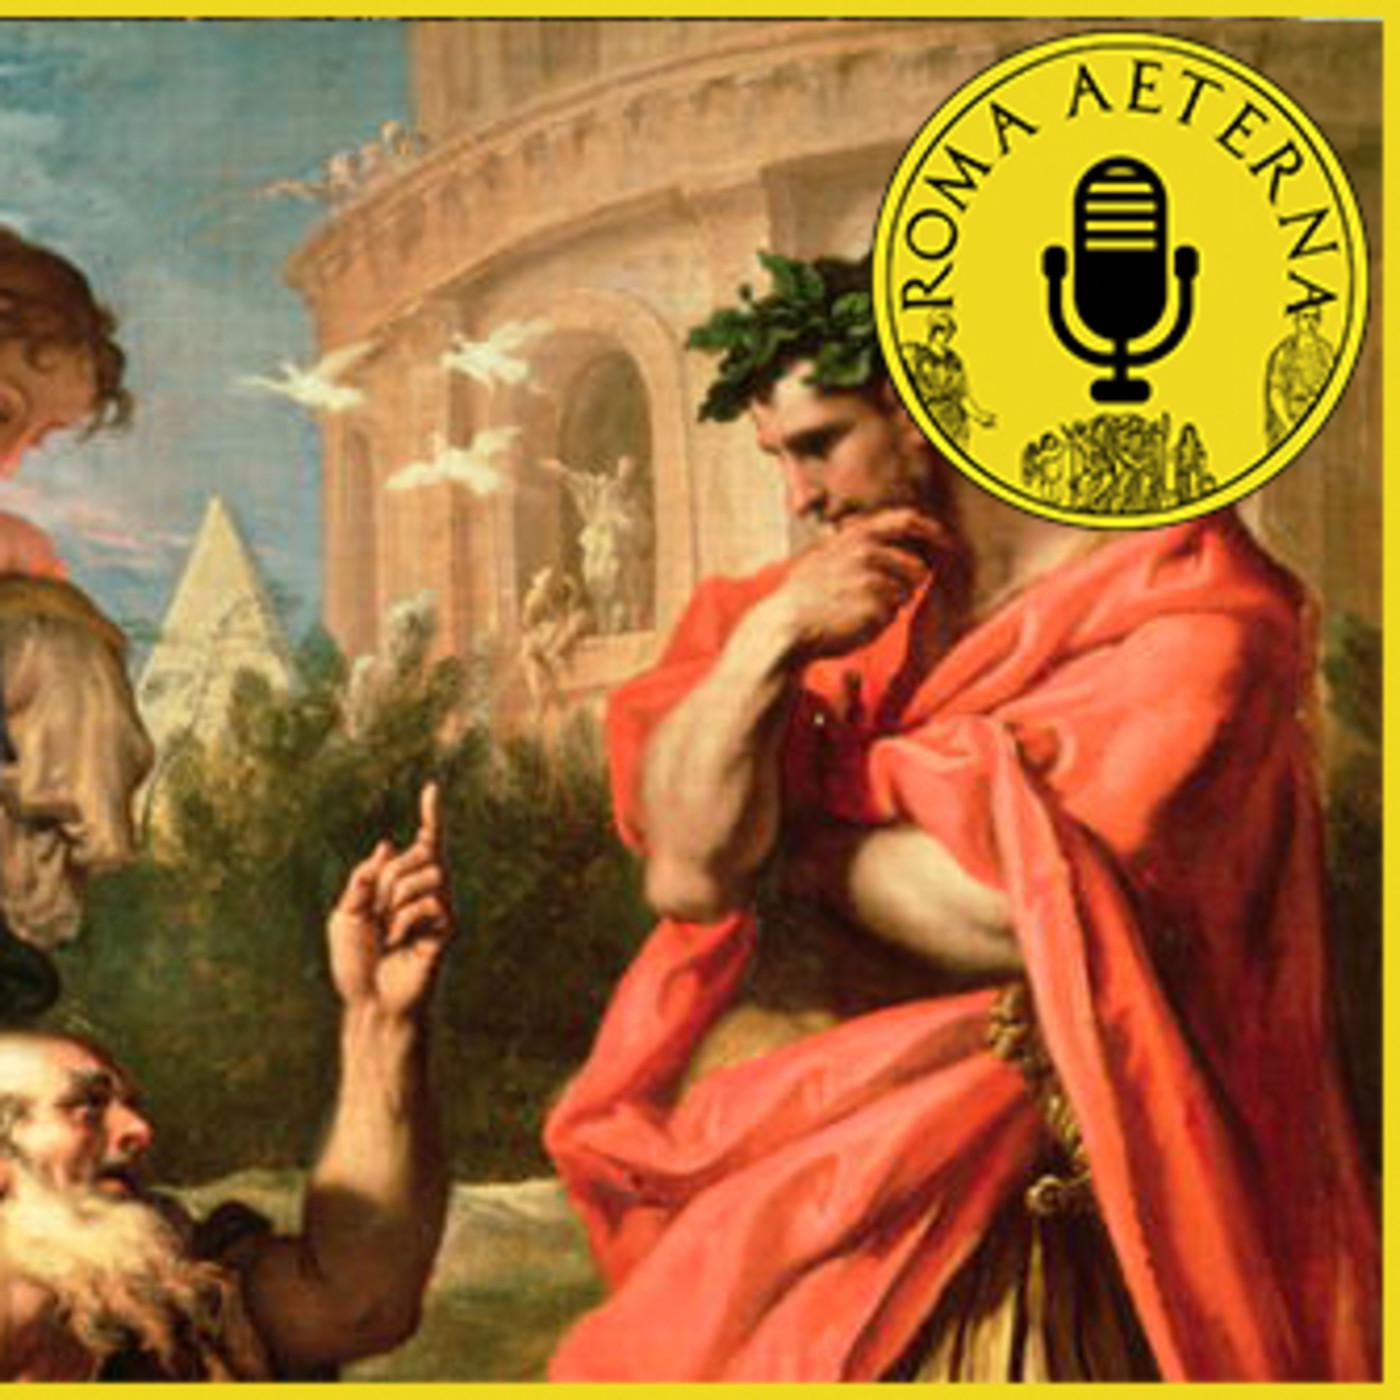 Programa 9 - Reyes de Roma V: Tarquinio Prisco, el etrusco.